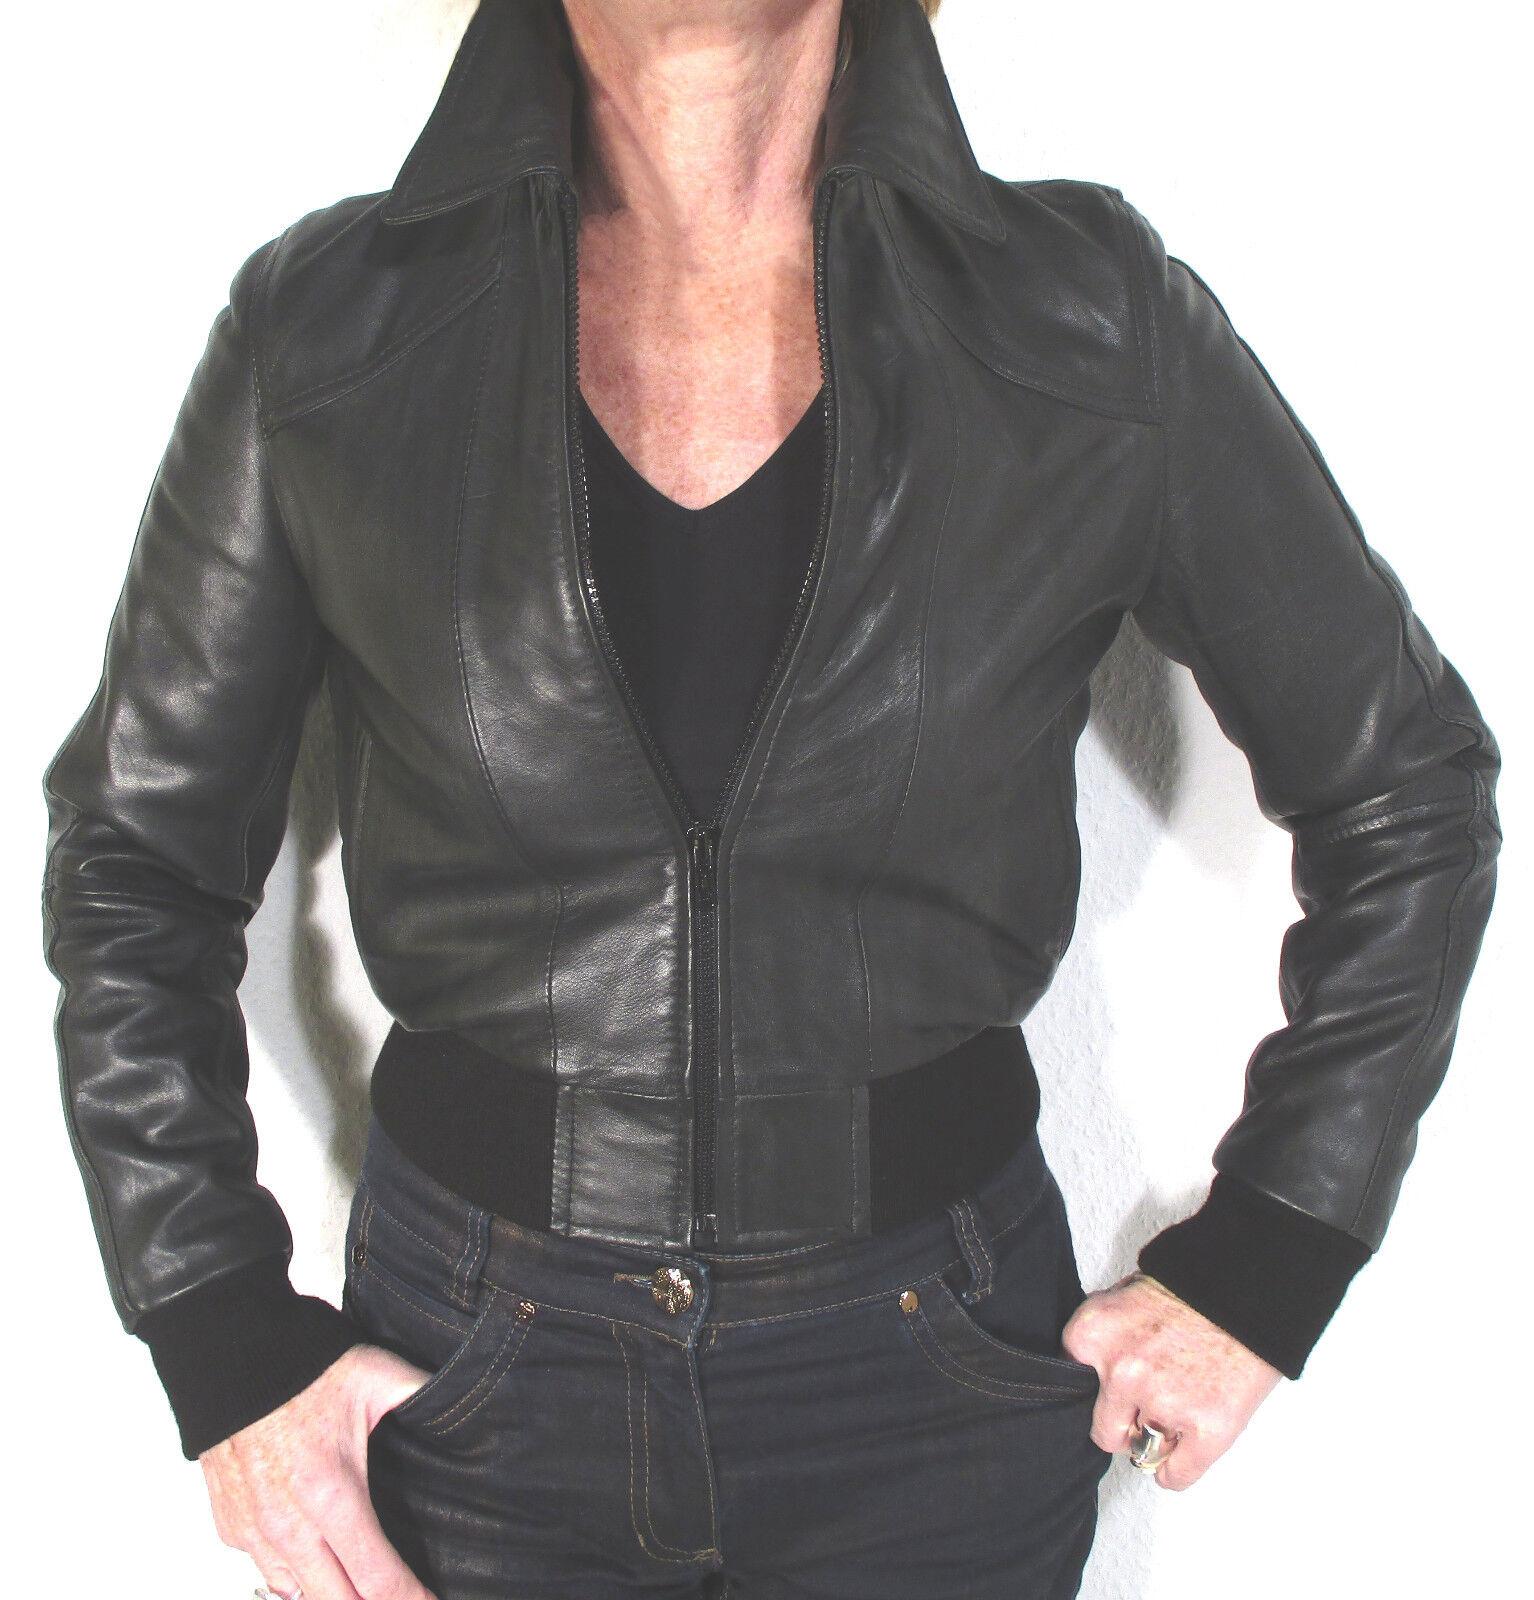 64067dcd982b5d Lederjacke Marke Blouson Form Schwarz Größe 34 Douglas Mac nupdtw7287-neue  Kleidung